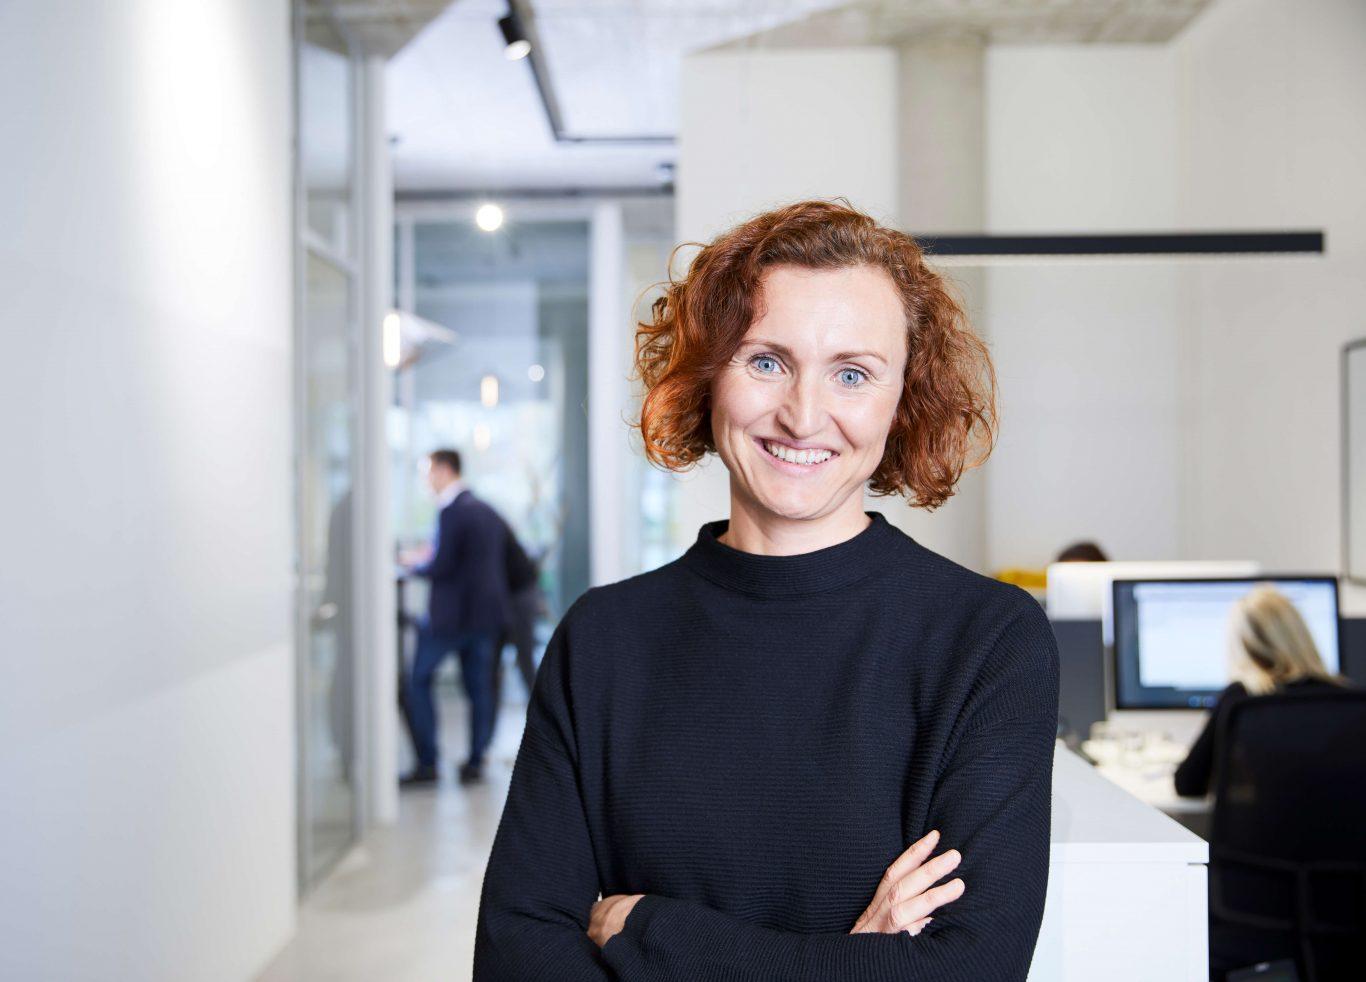 Martina Stöbich